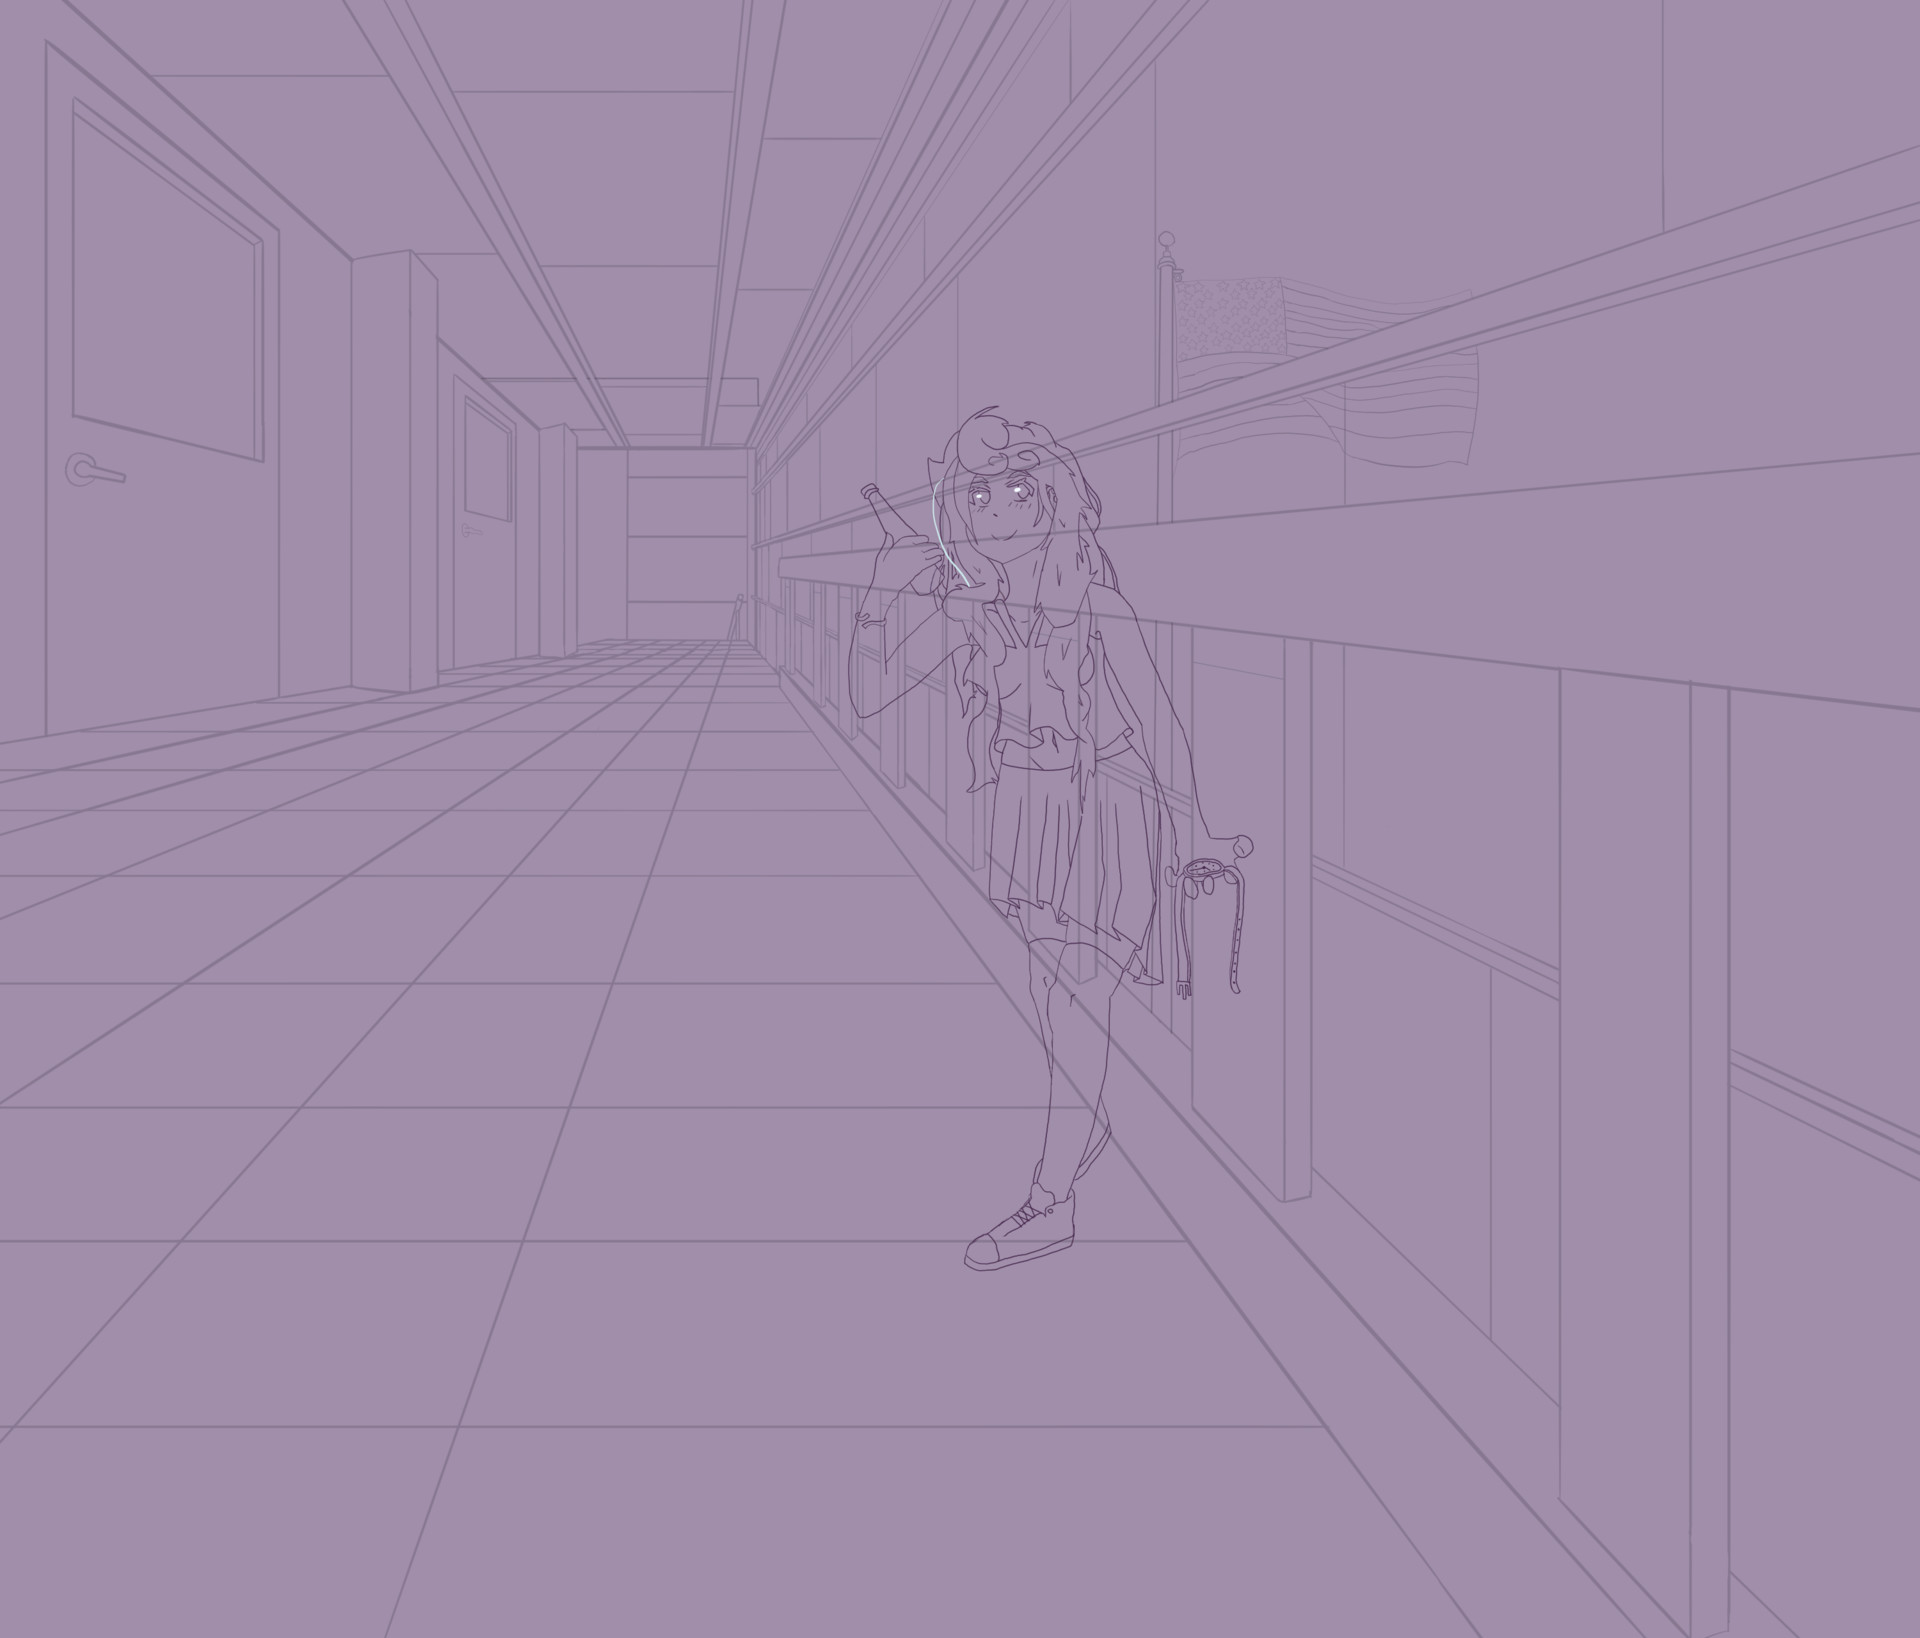 Joseph chanice hallway linework